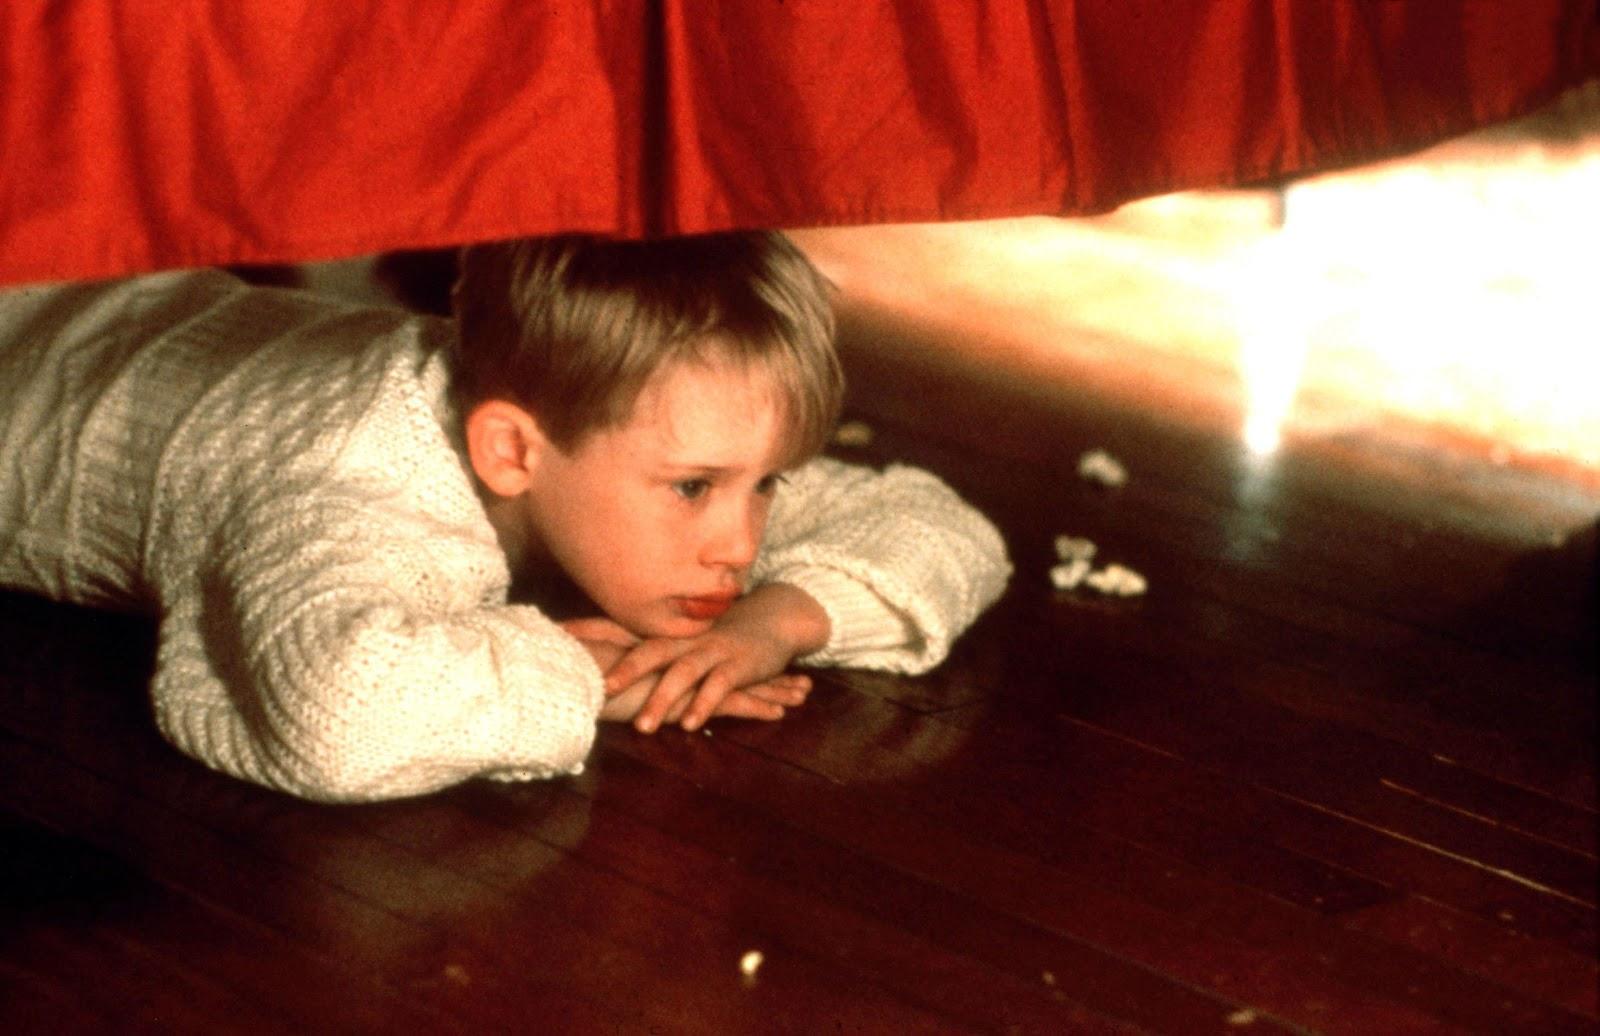 Macaulay_Culkin_-_Home_Alone_1990_13.jpg